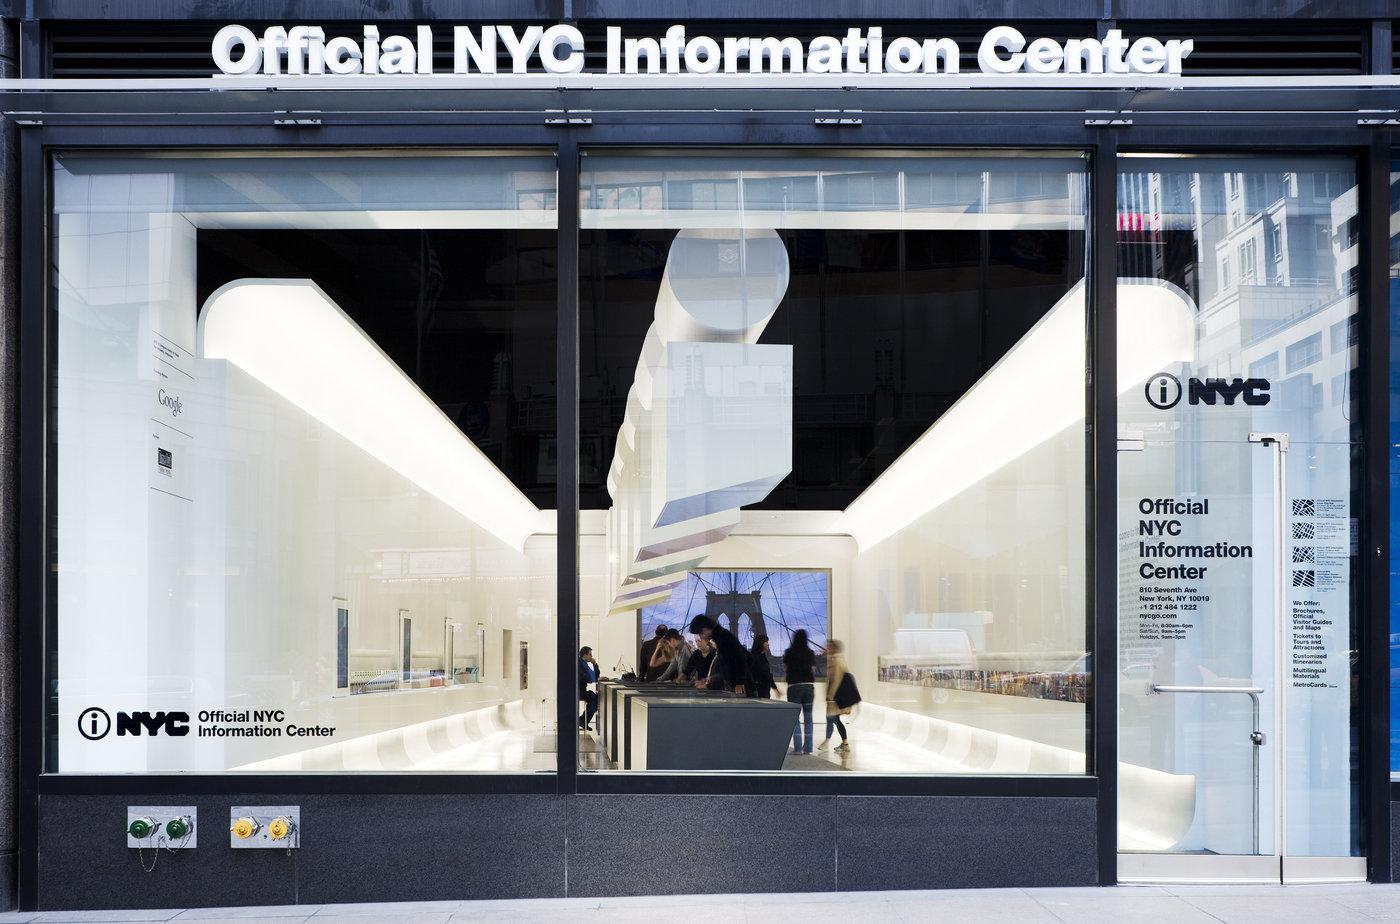 nyc information center